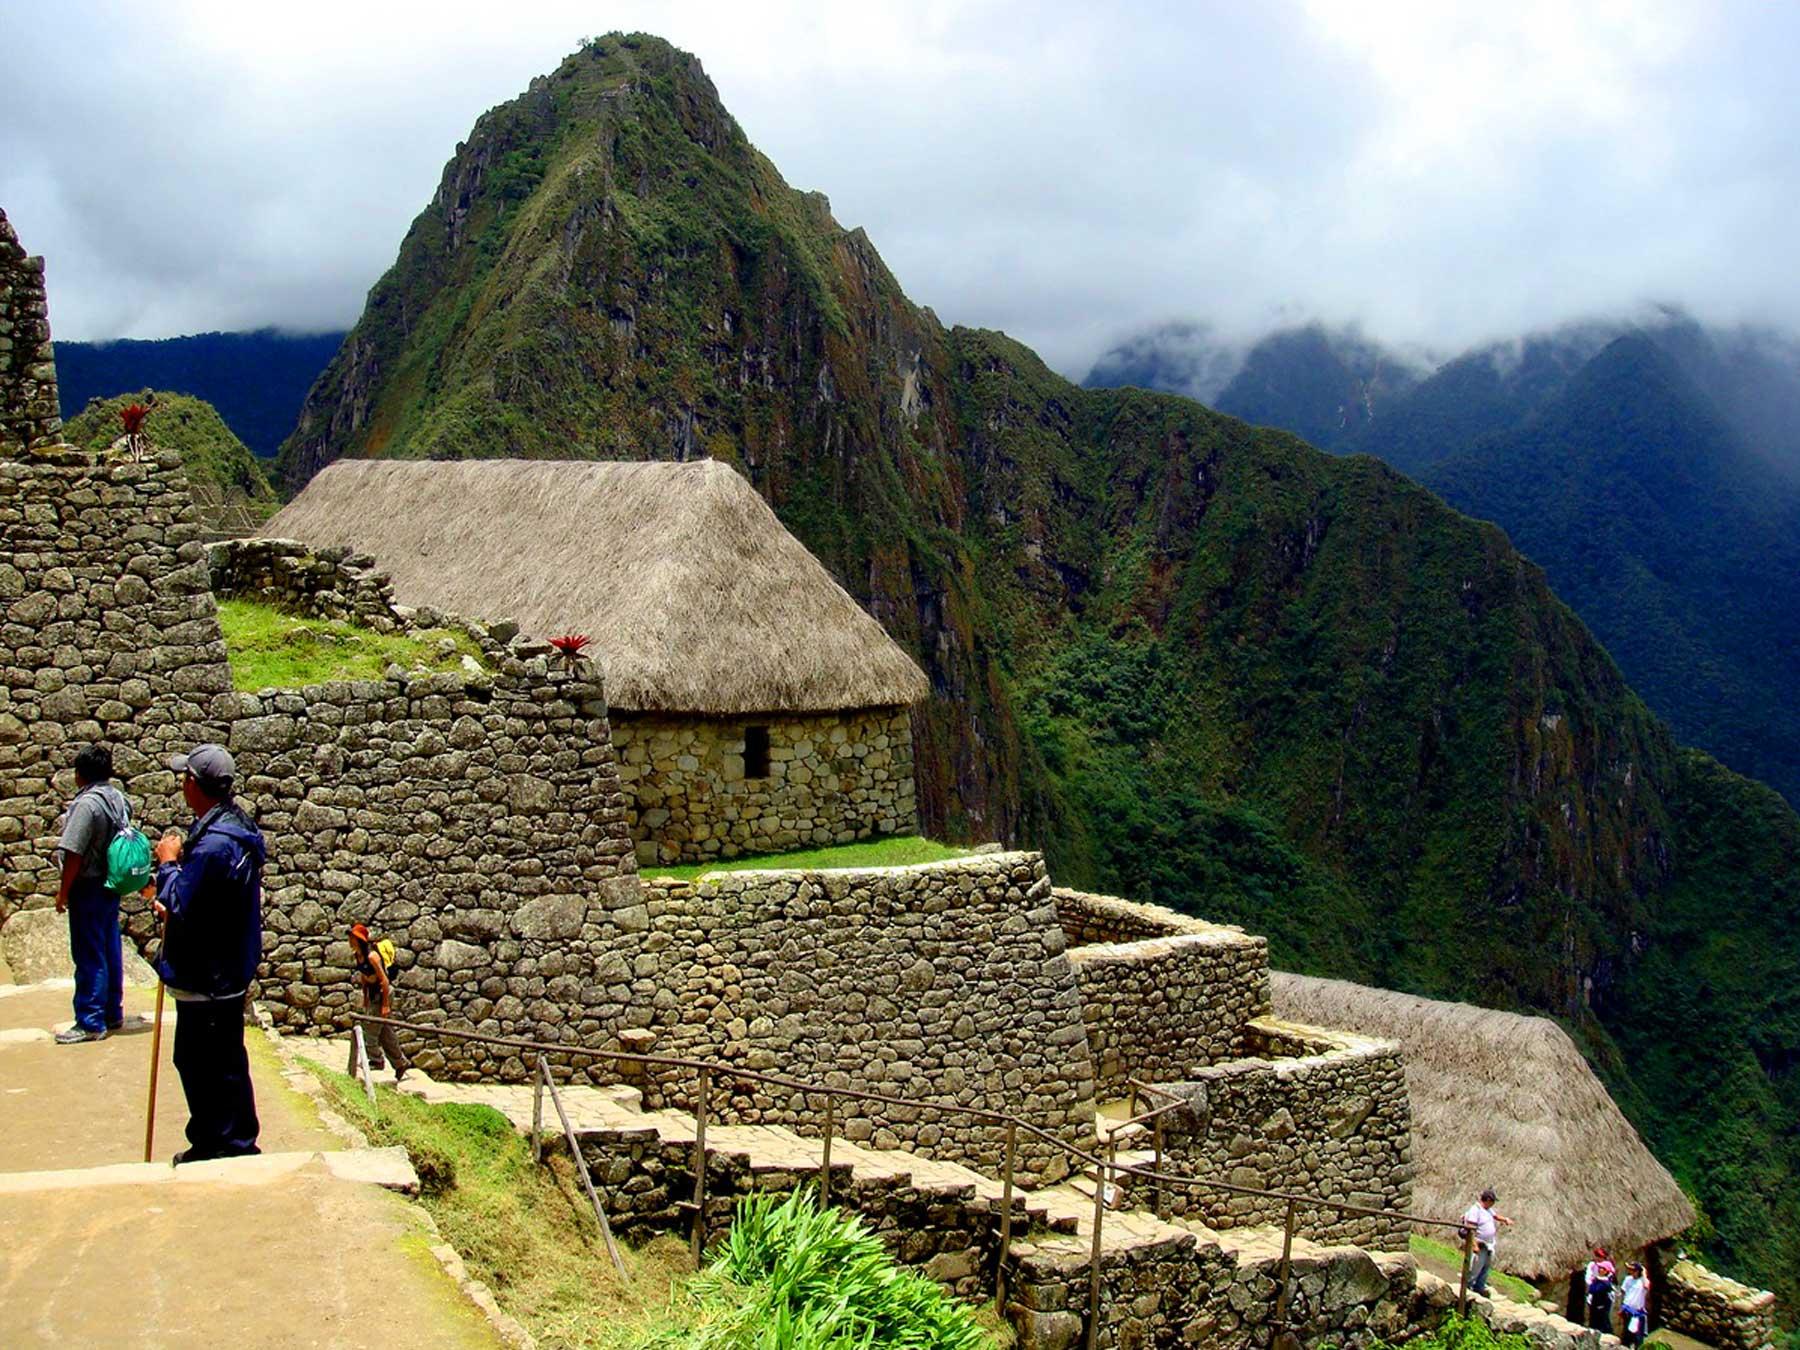 Al ingresar a Machu Picchu, observaremos esta gradería impresionante